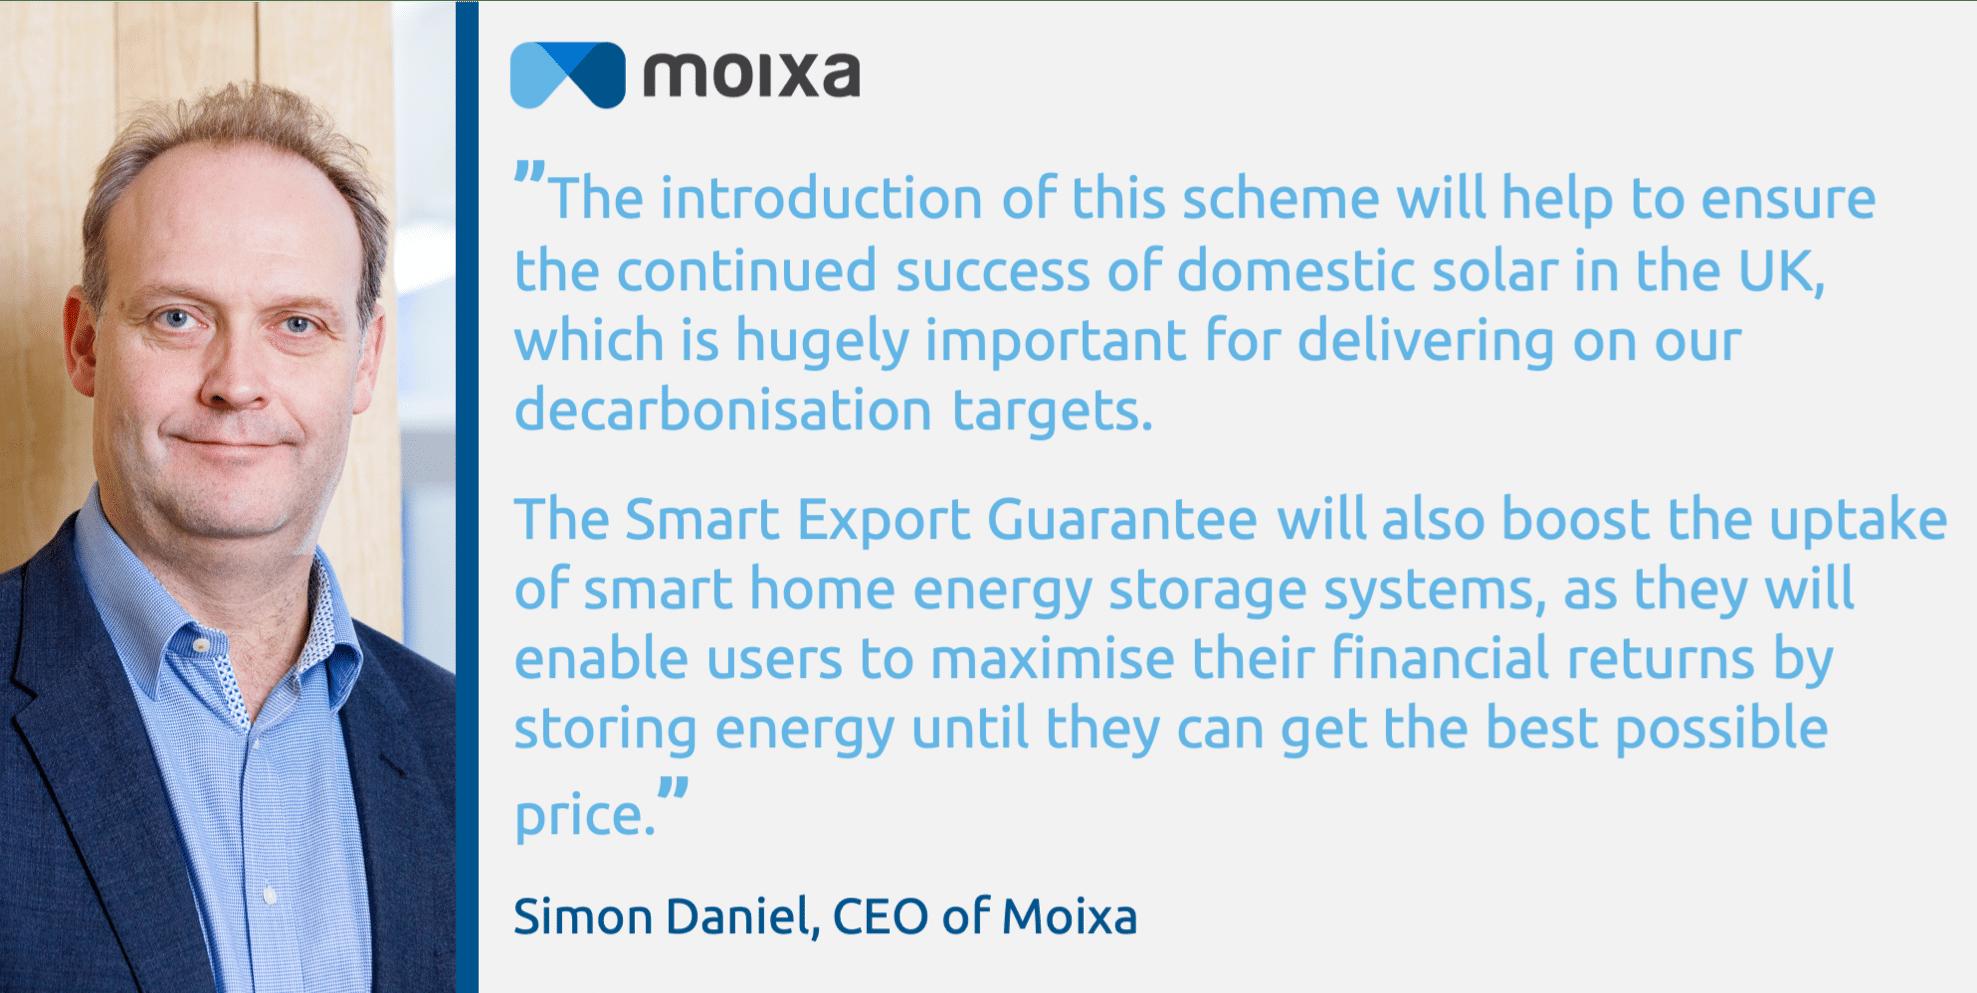 Smart Export Guarantee Quote Moixa | Home Energy Storage | Smart Energy Management